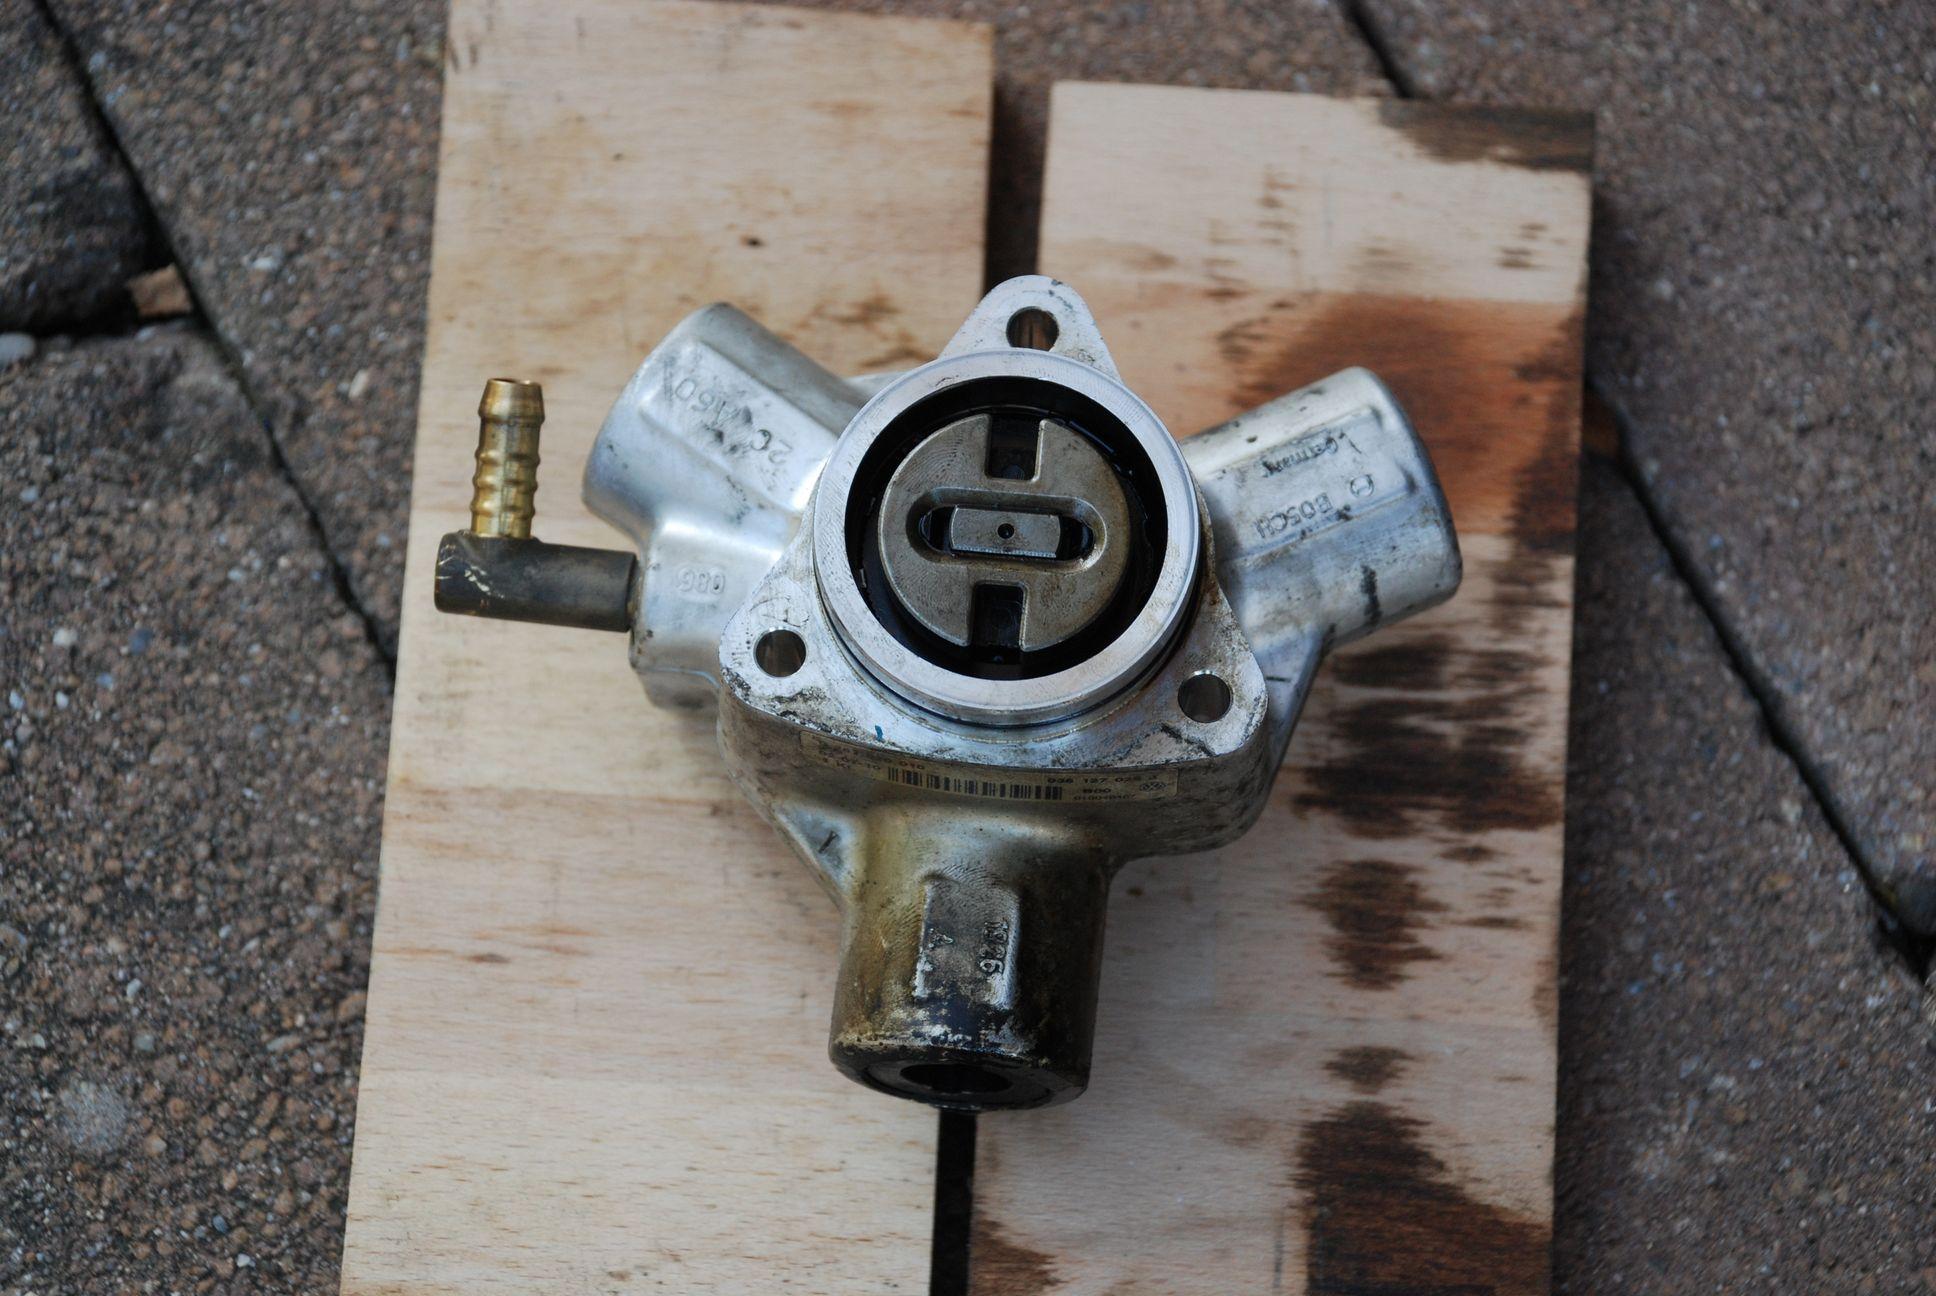 Hochdrucktreibstoffpumpe_2.JPG.f4f95e0510815a5cfd26a38780d858a1.JPG